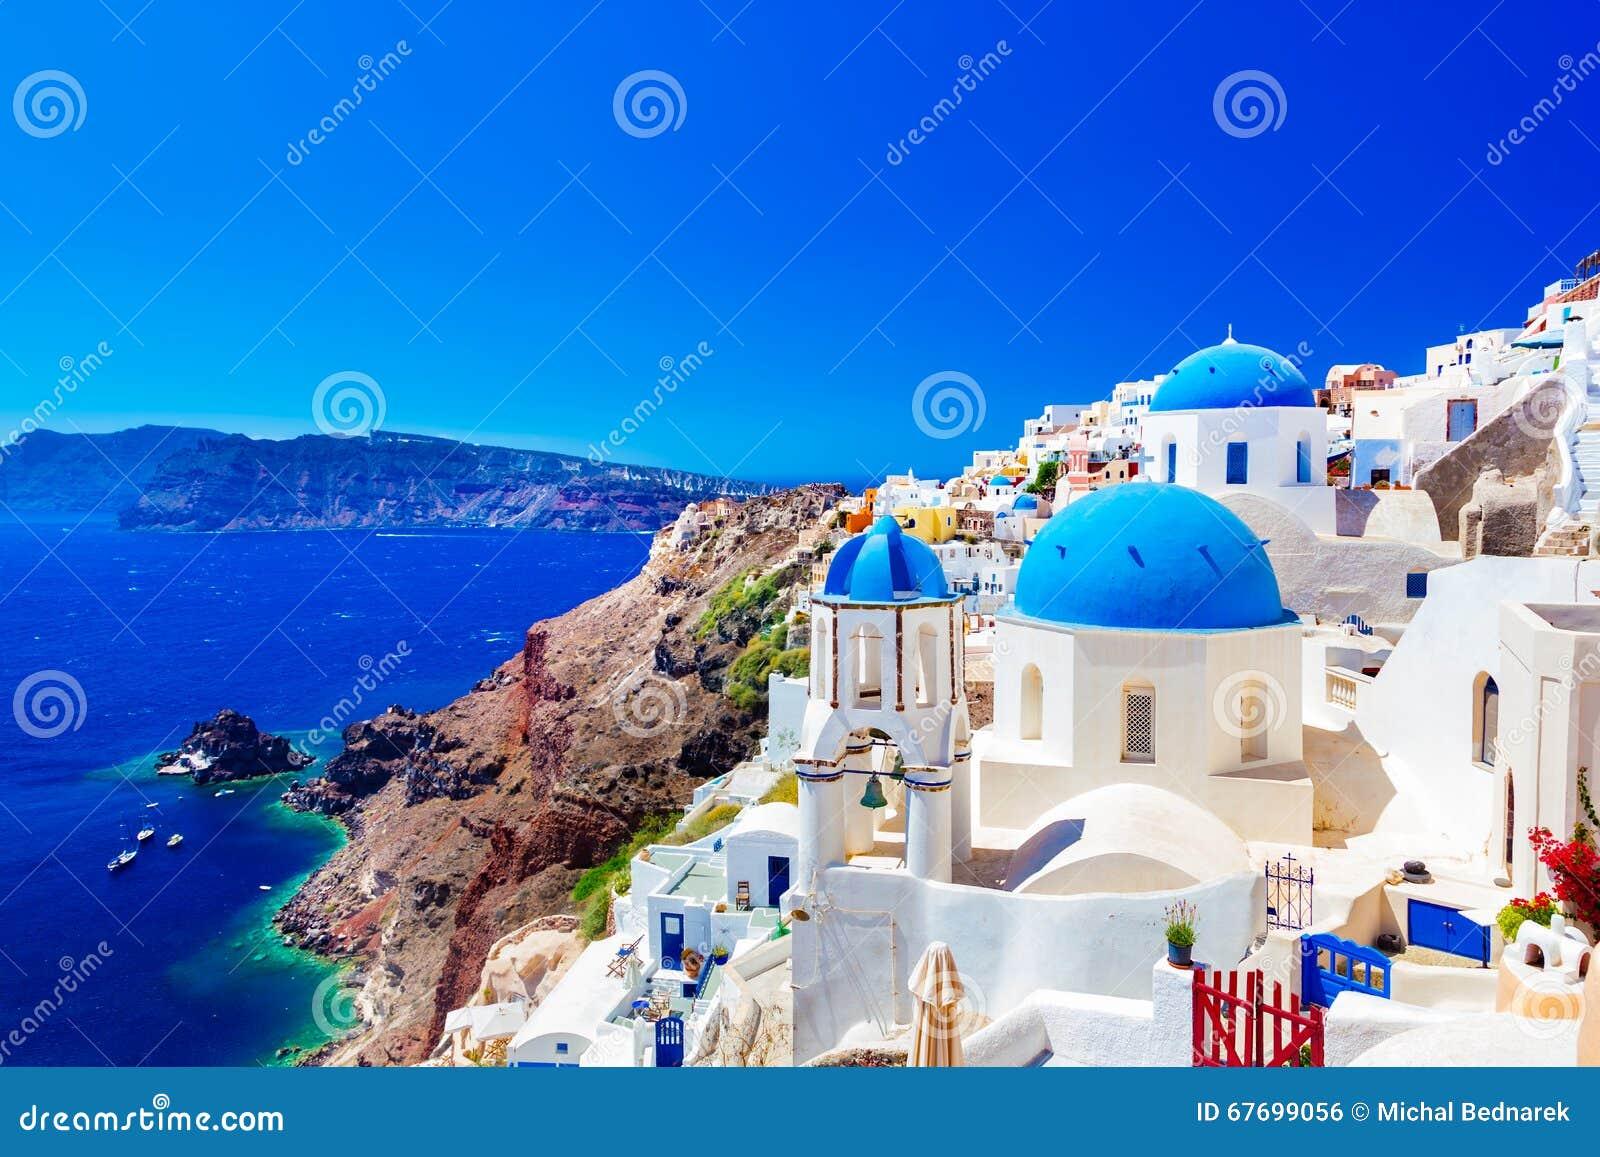 Oia town on Santorini island, Greece. Caldera on Aegean sea.